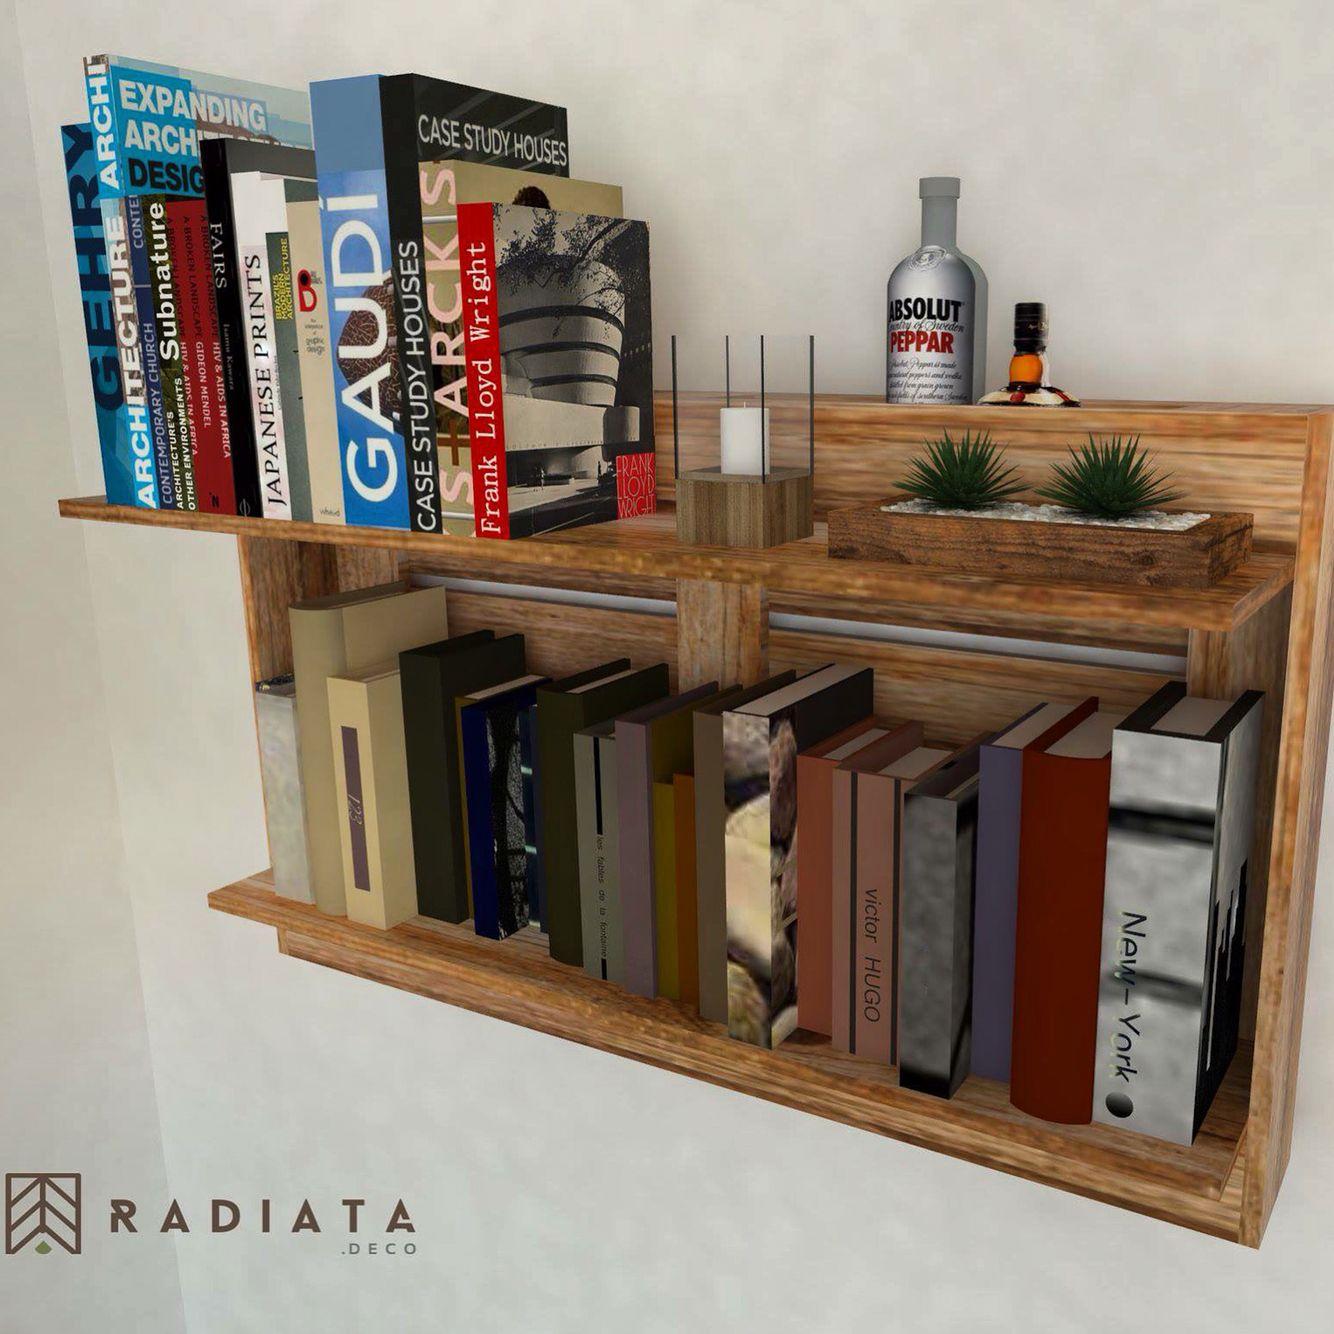 Estanteria hecha con palets estanterias hechas con palets elegant estanteras de with estanteria - Estanteria hecha con palets ...